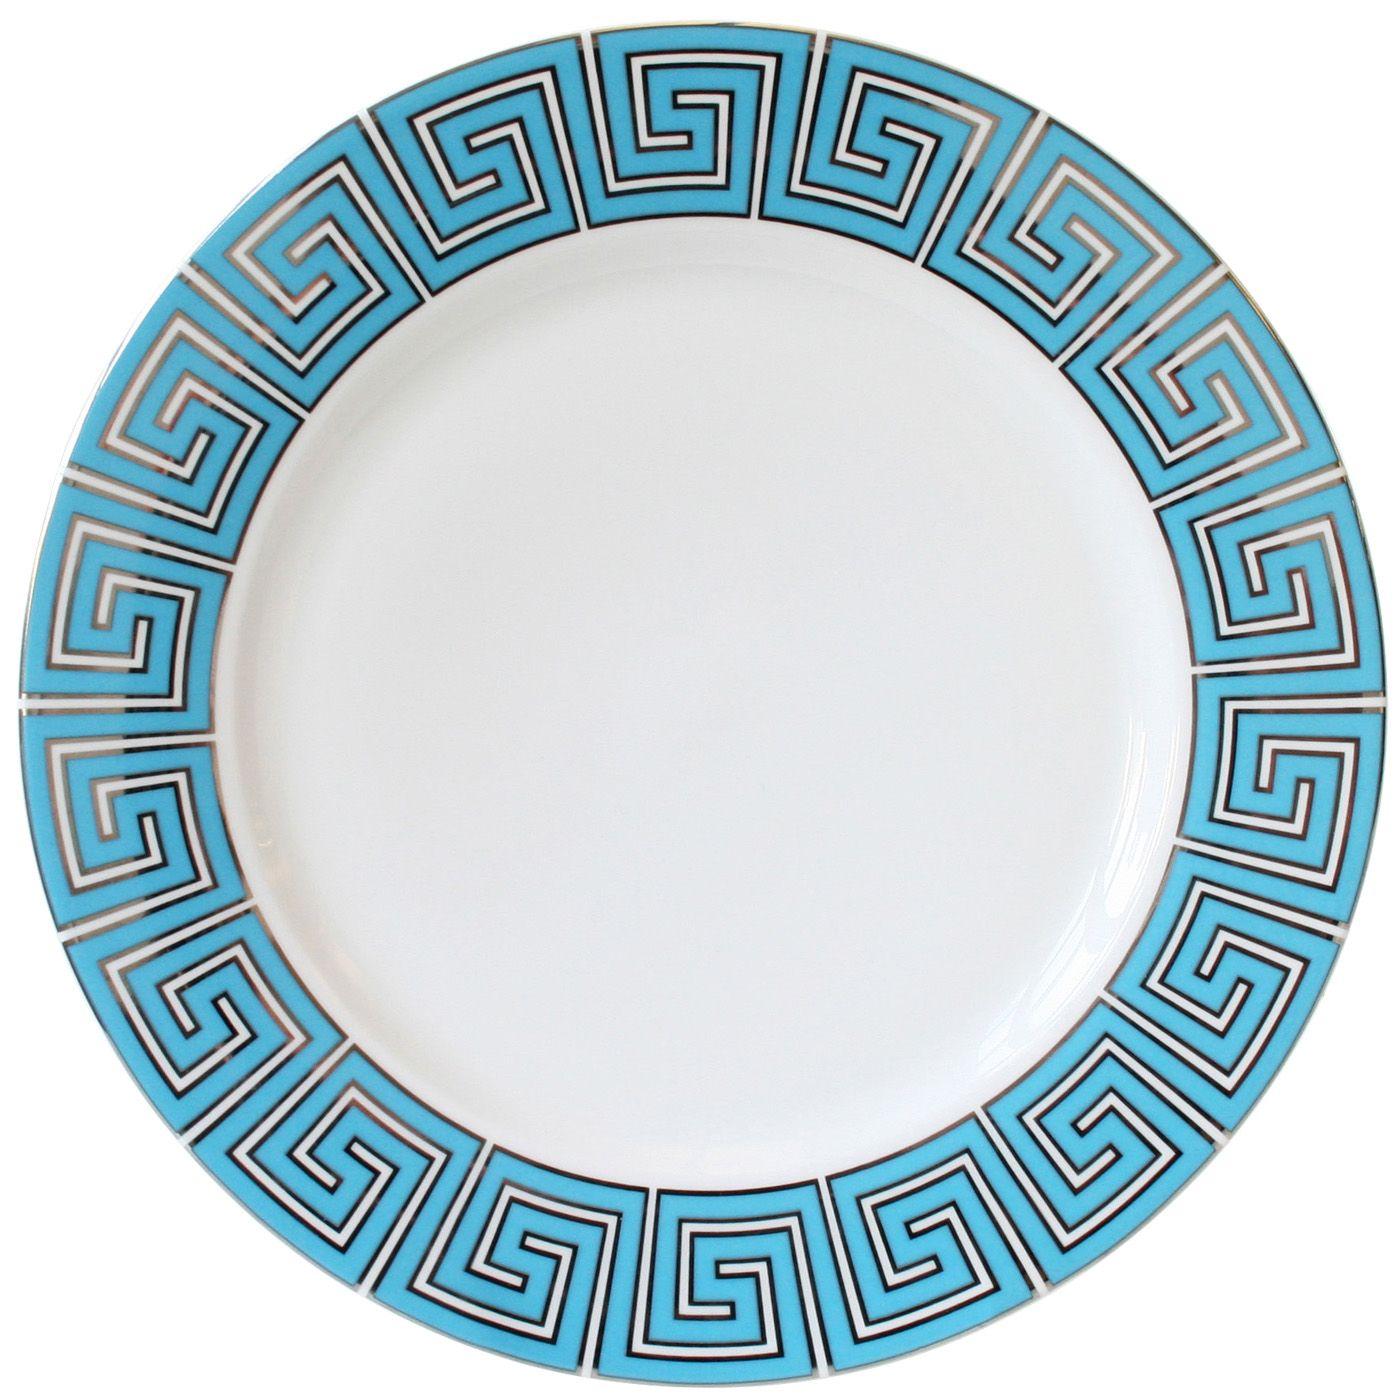 modern tableware  greek key dinner plate  jonathan adler  - jonathan adler greek key dinner plate  modern and classic